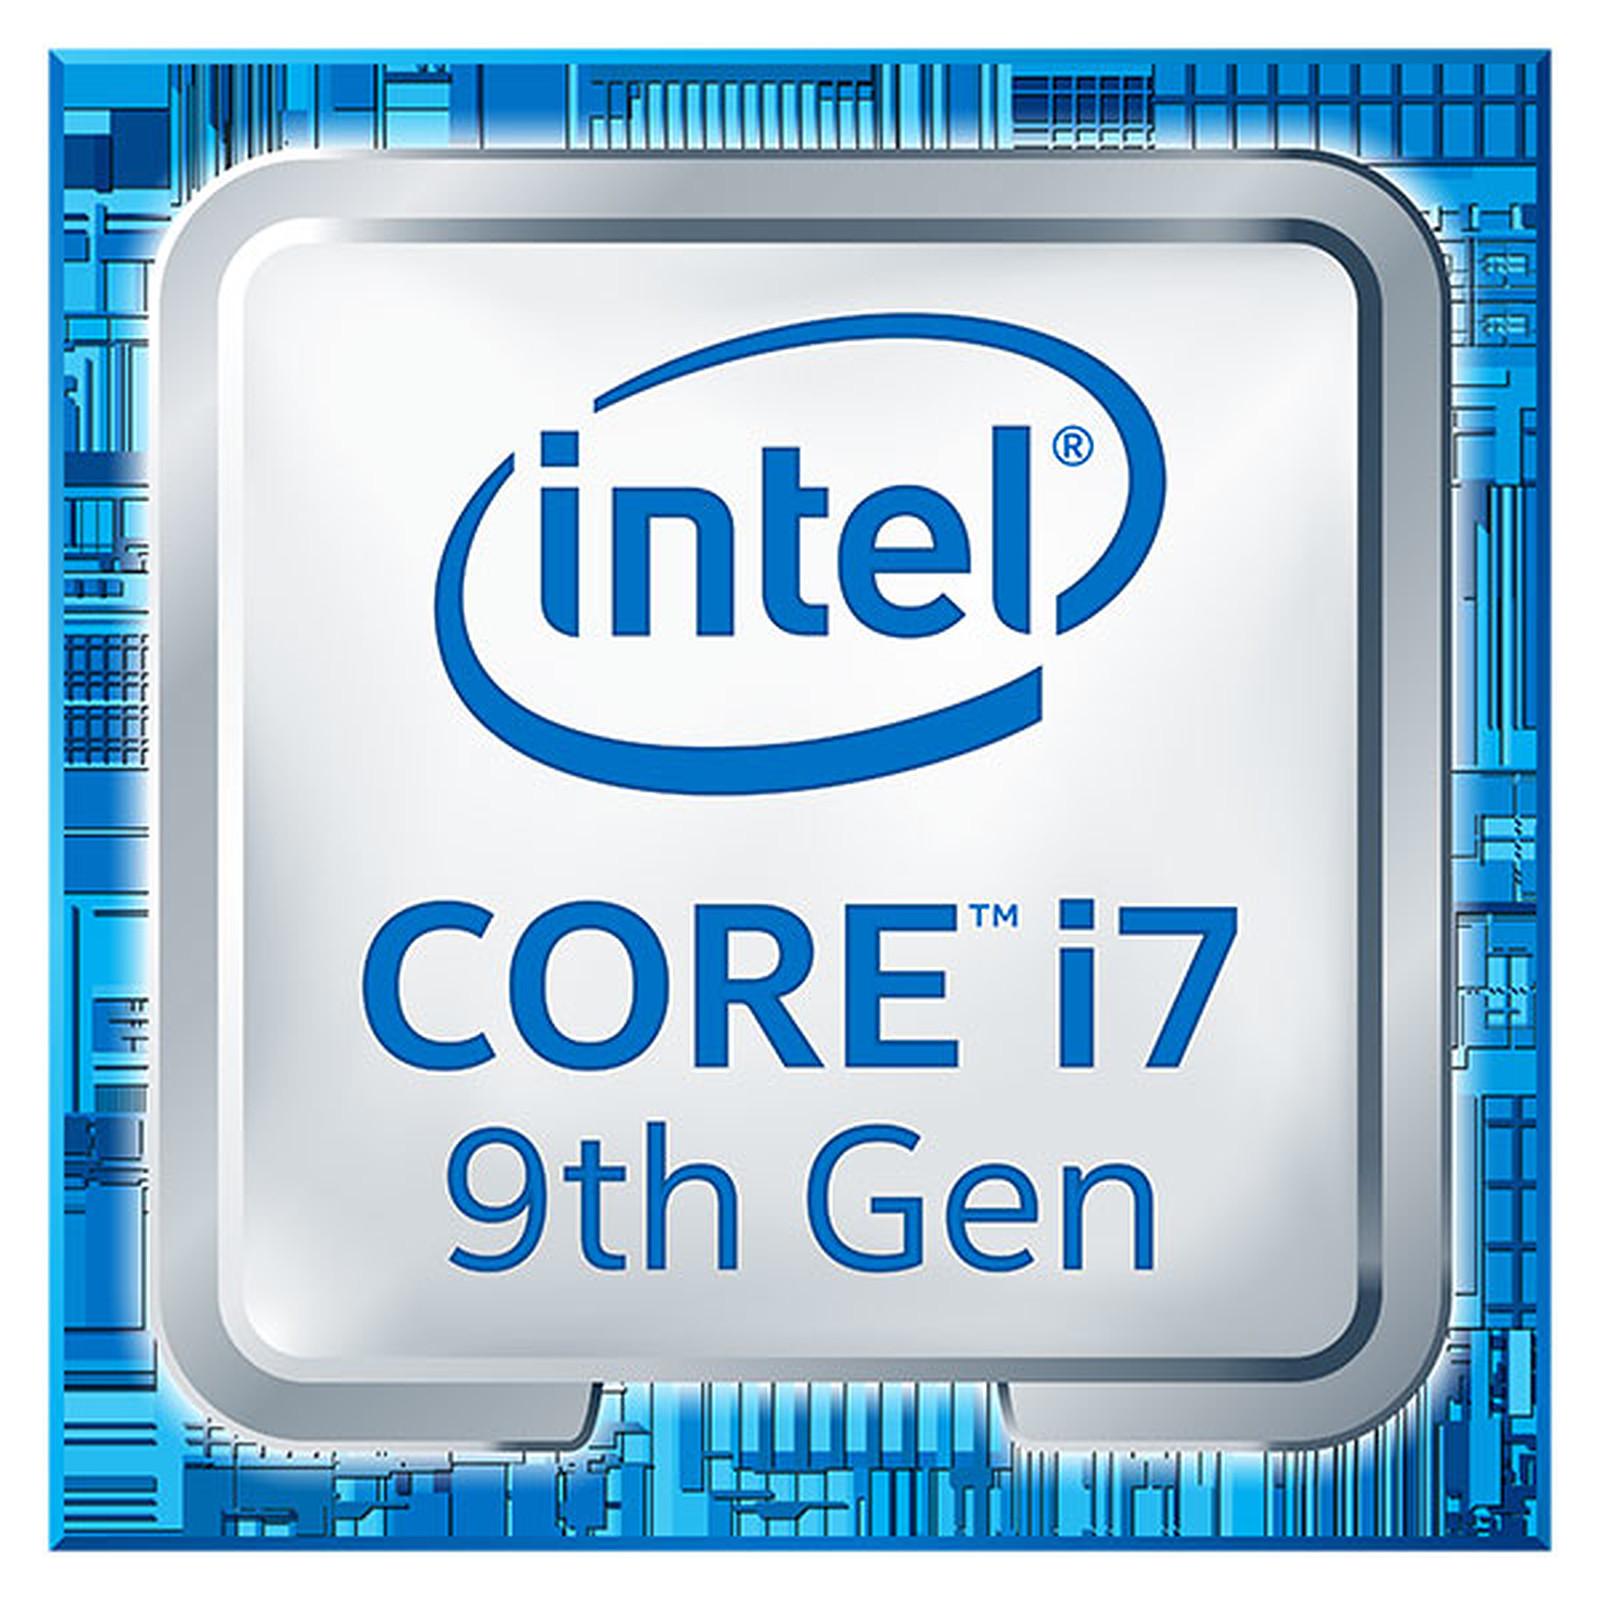 Intel Core i7-9700K (3.6 GHz / 4.9 GHz) (Bulk)